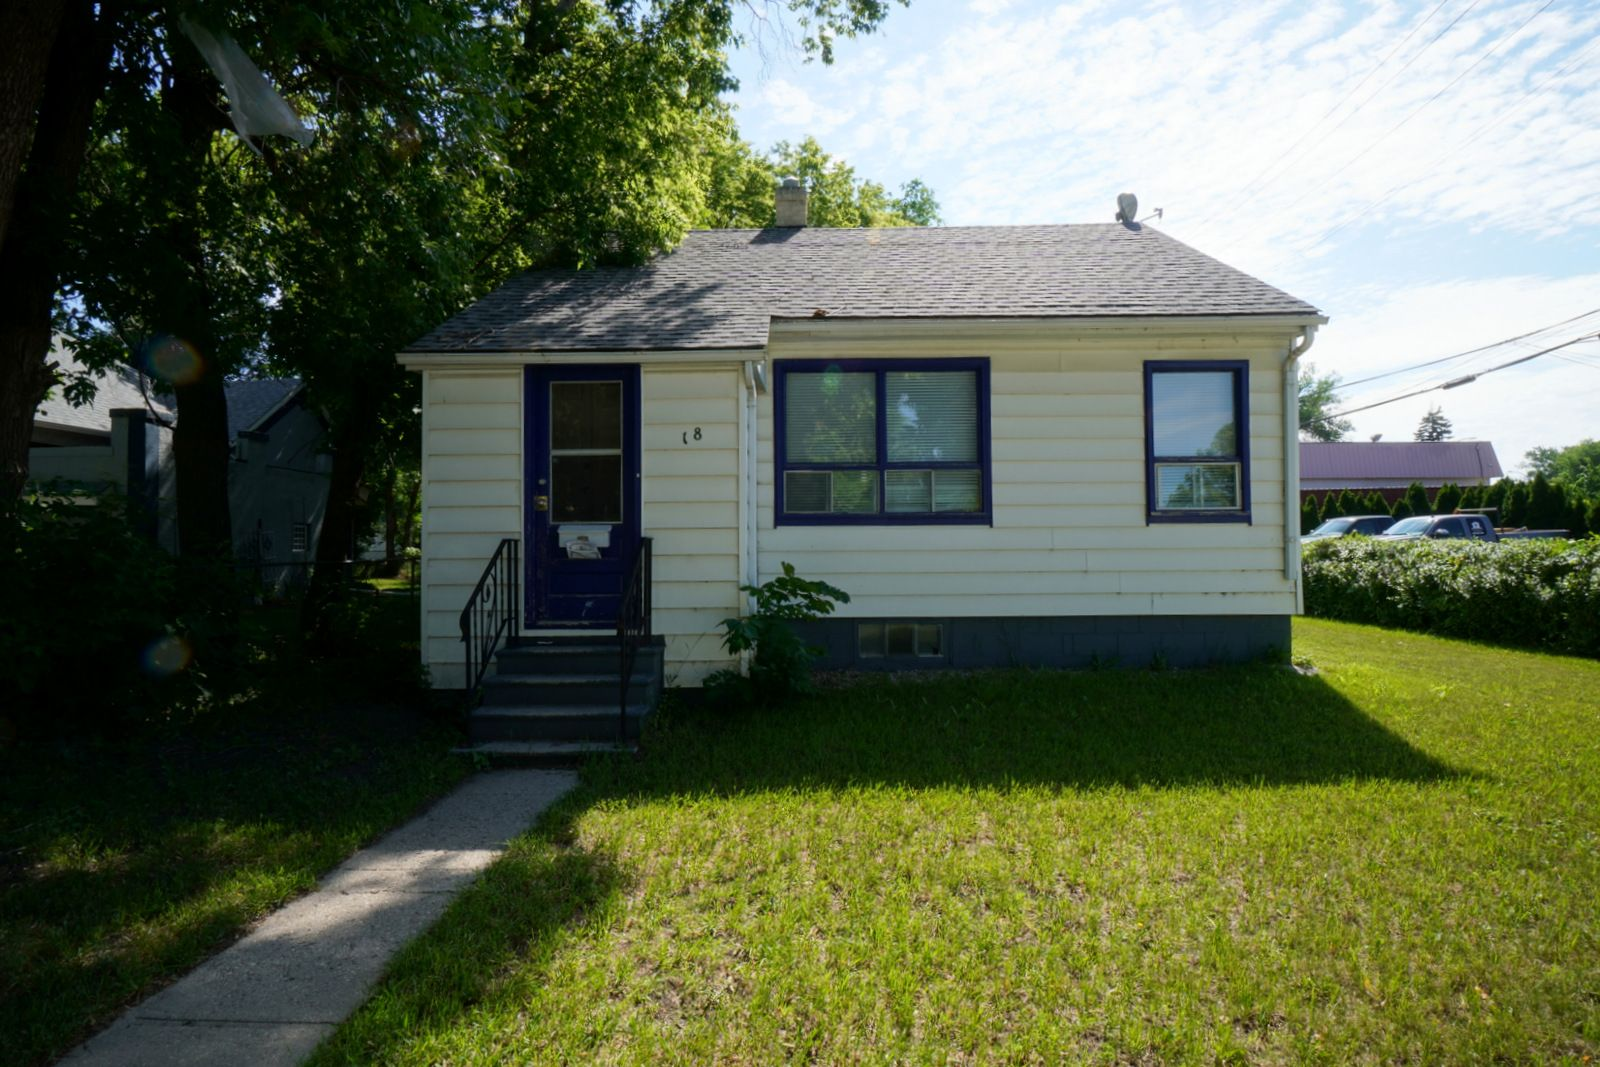 Main Photo: 18 5th Street NE in Portage la Prairie: House for sale : MLS®# 202116235